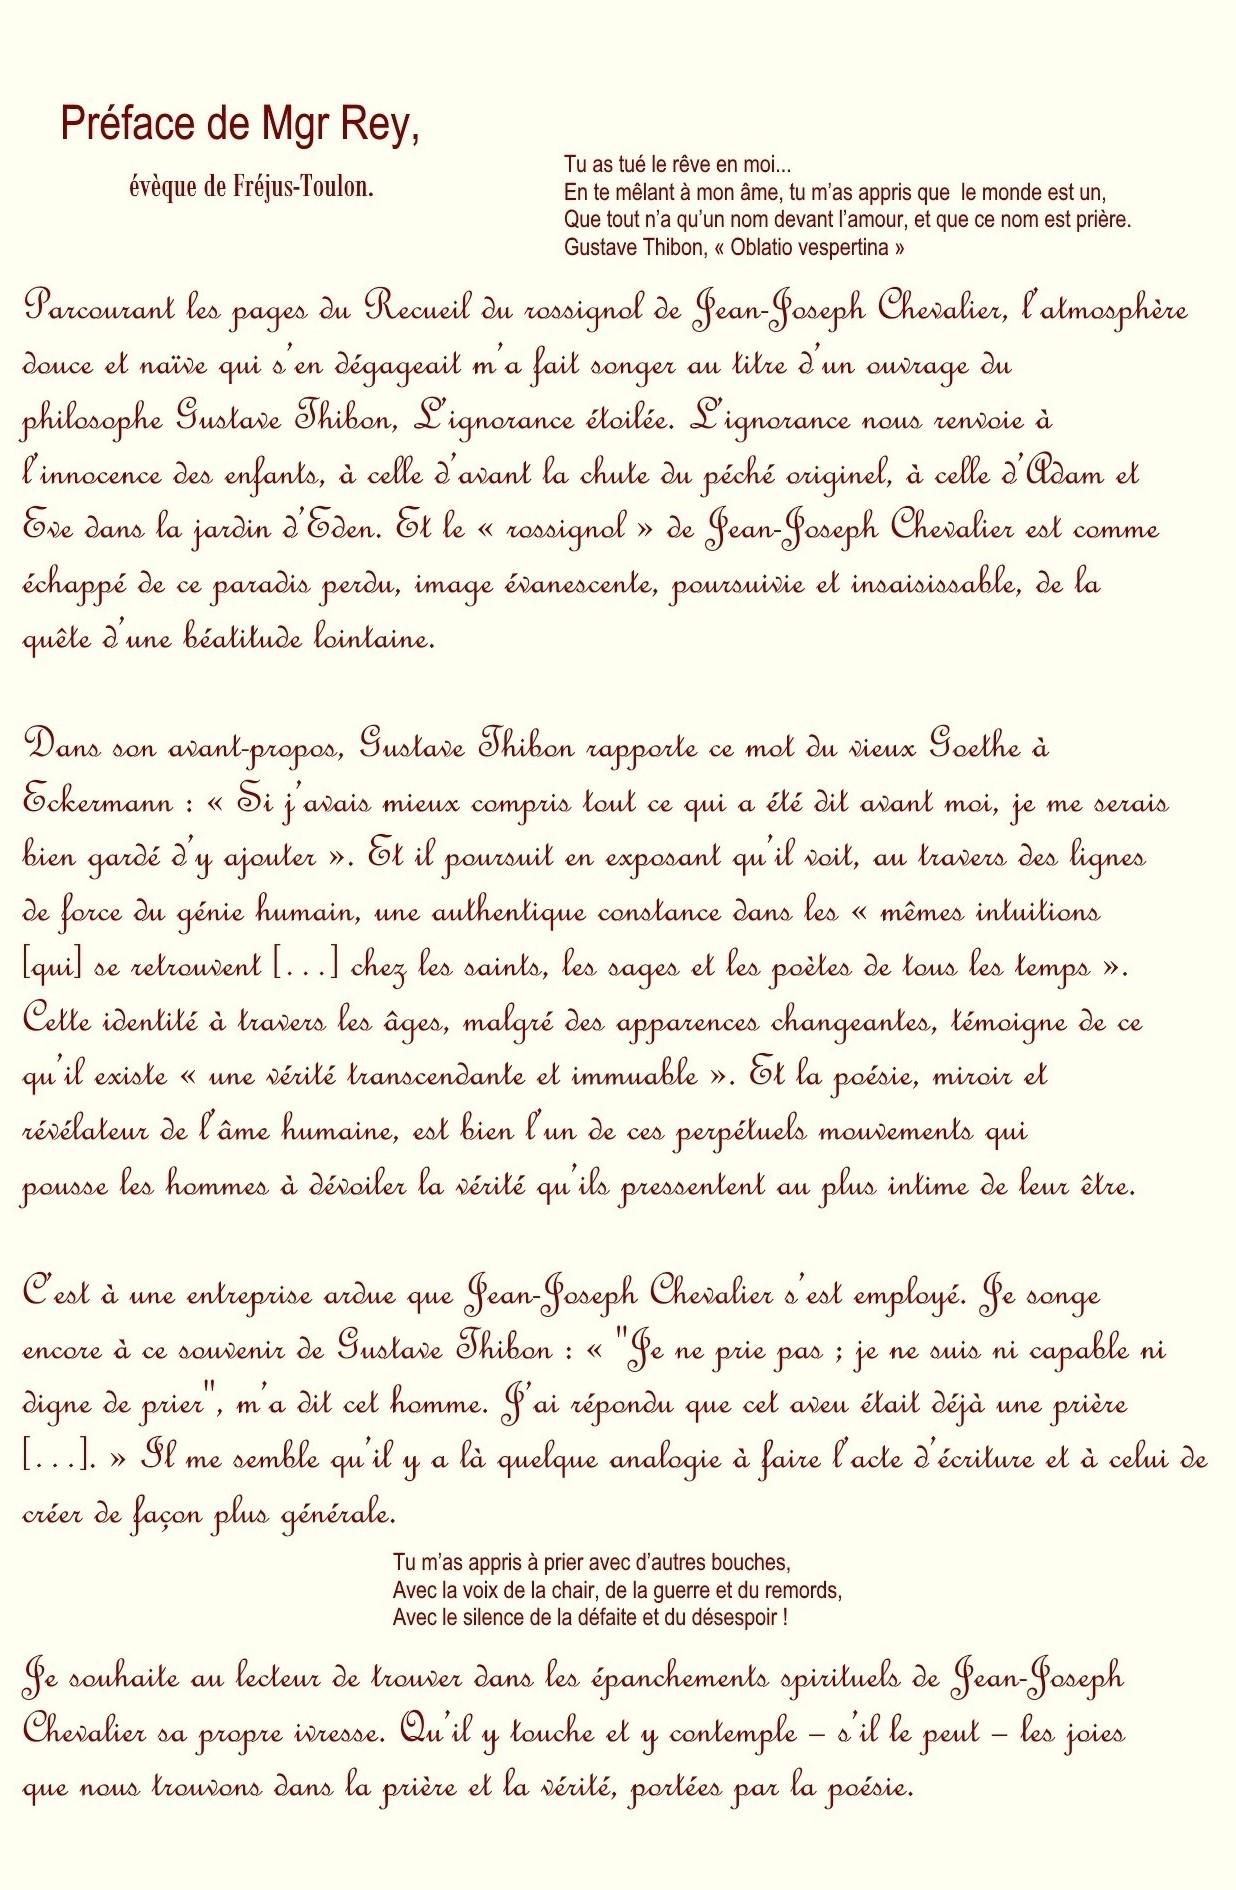 Recueil du rossignol poeme et sanguine de jean joseph chevalier 1